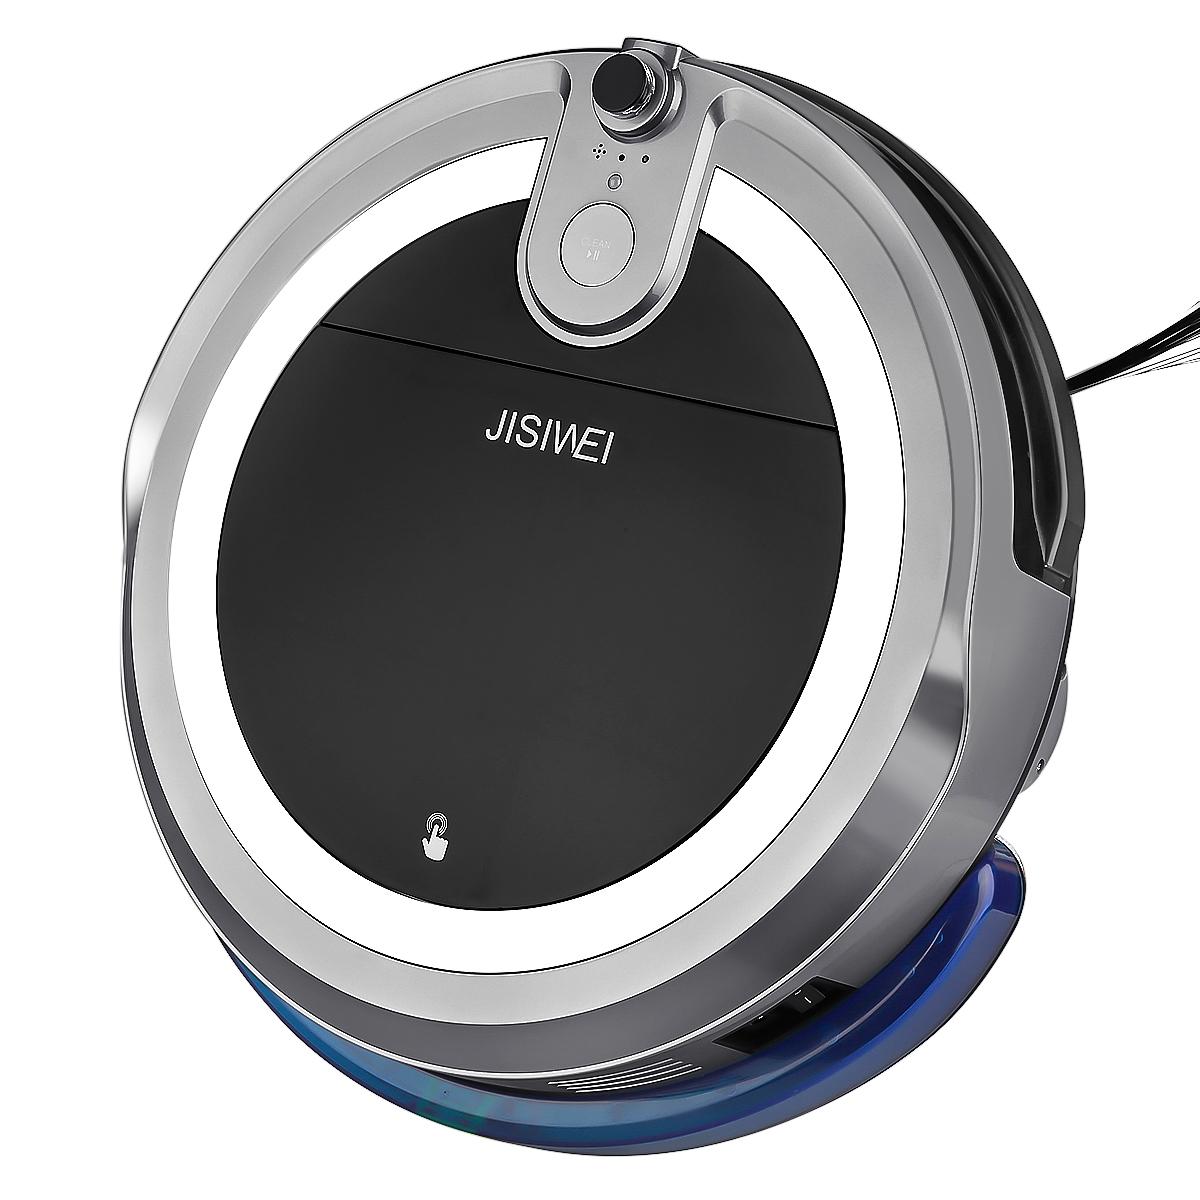 JISIWEI I3 Wi-Fi Enabled Robotic Vacuum Cleaner Self Char...